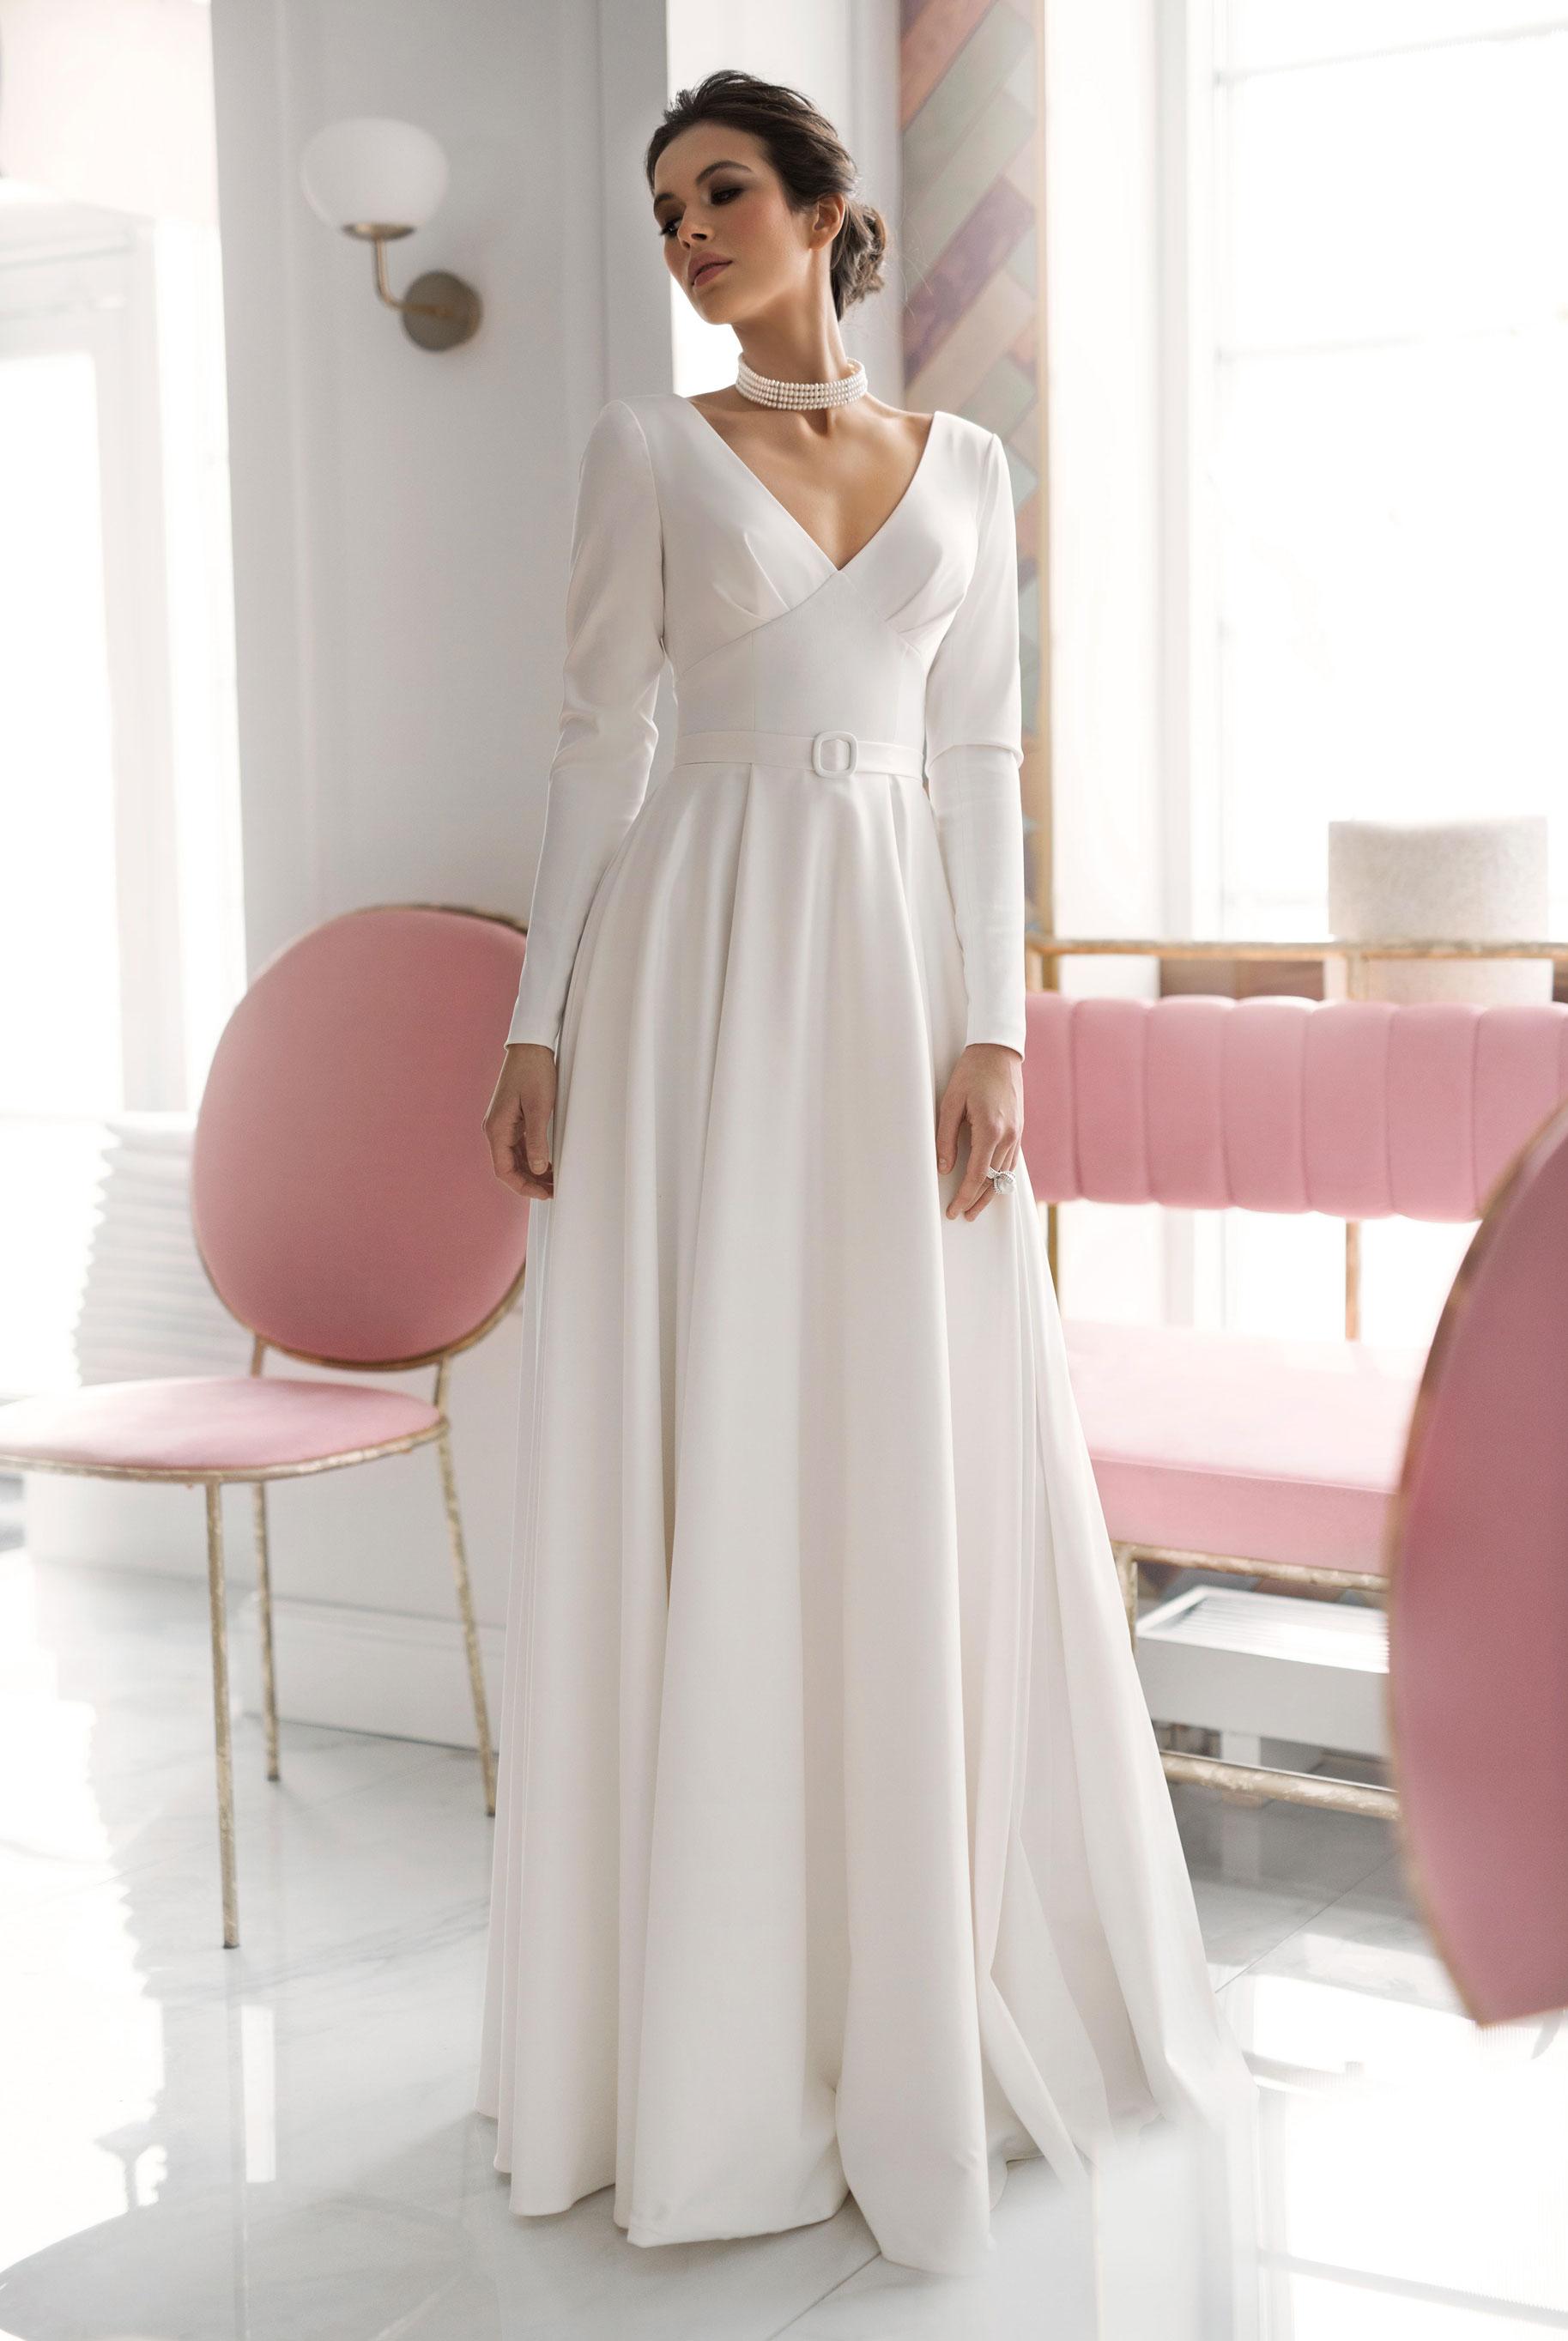 Ксения Саладуха в свадебных нарядах Ave Wedding, весна-лето 2019 / фото 05